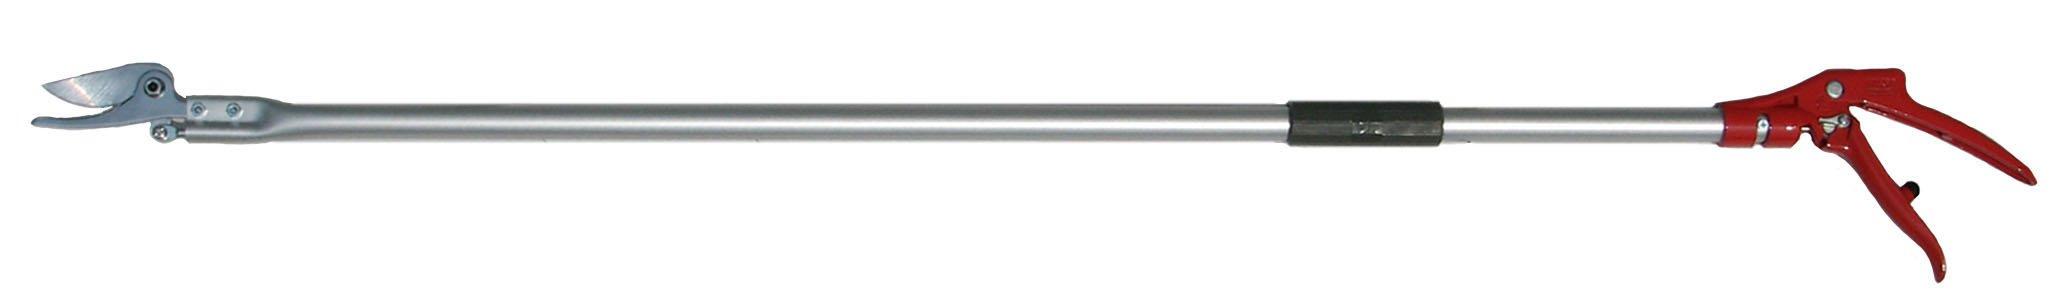 ARS LA-180R12 Long Reach Pruner, 4-Feet